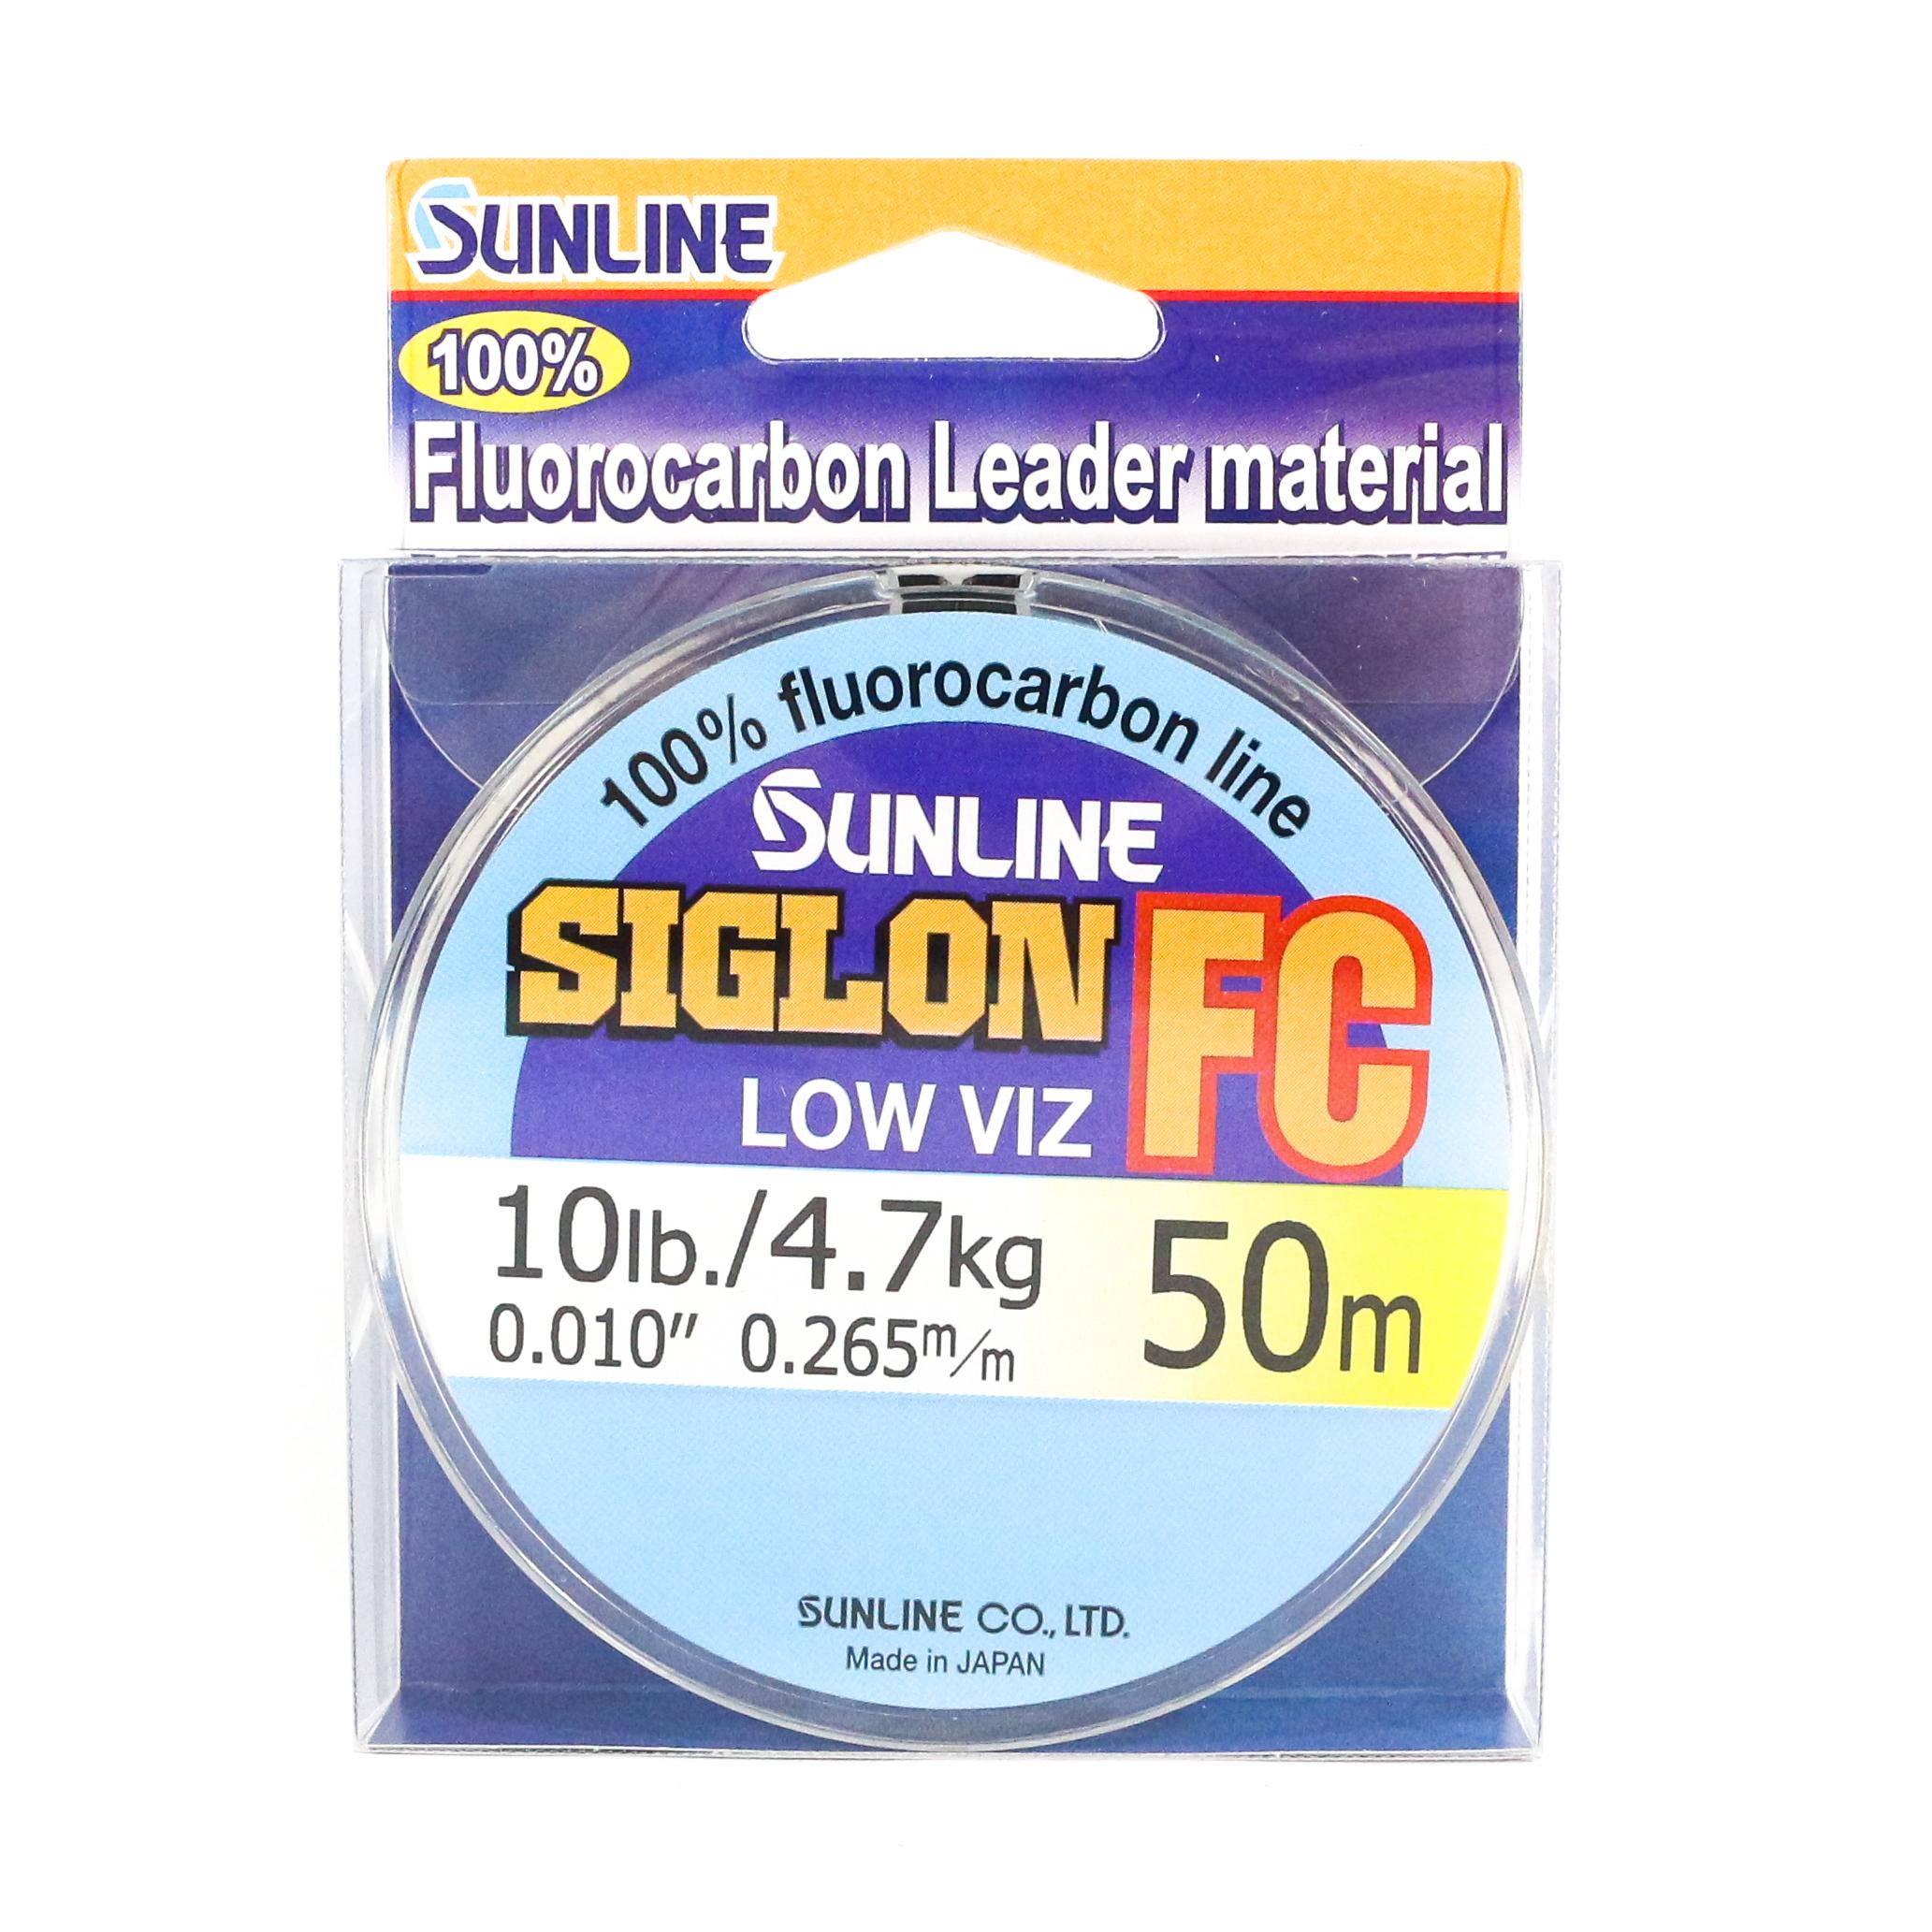 Sunline Siglon FC Fluorocarbon Line 50m 10lb Diameter 0.265 mm (5853)